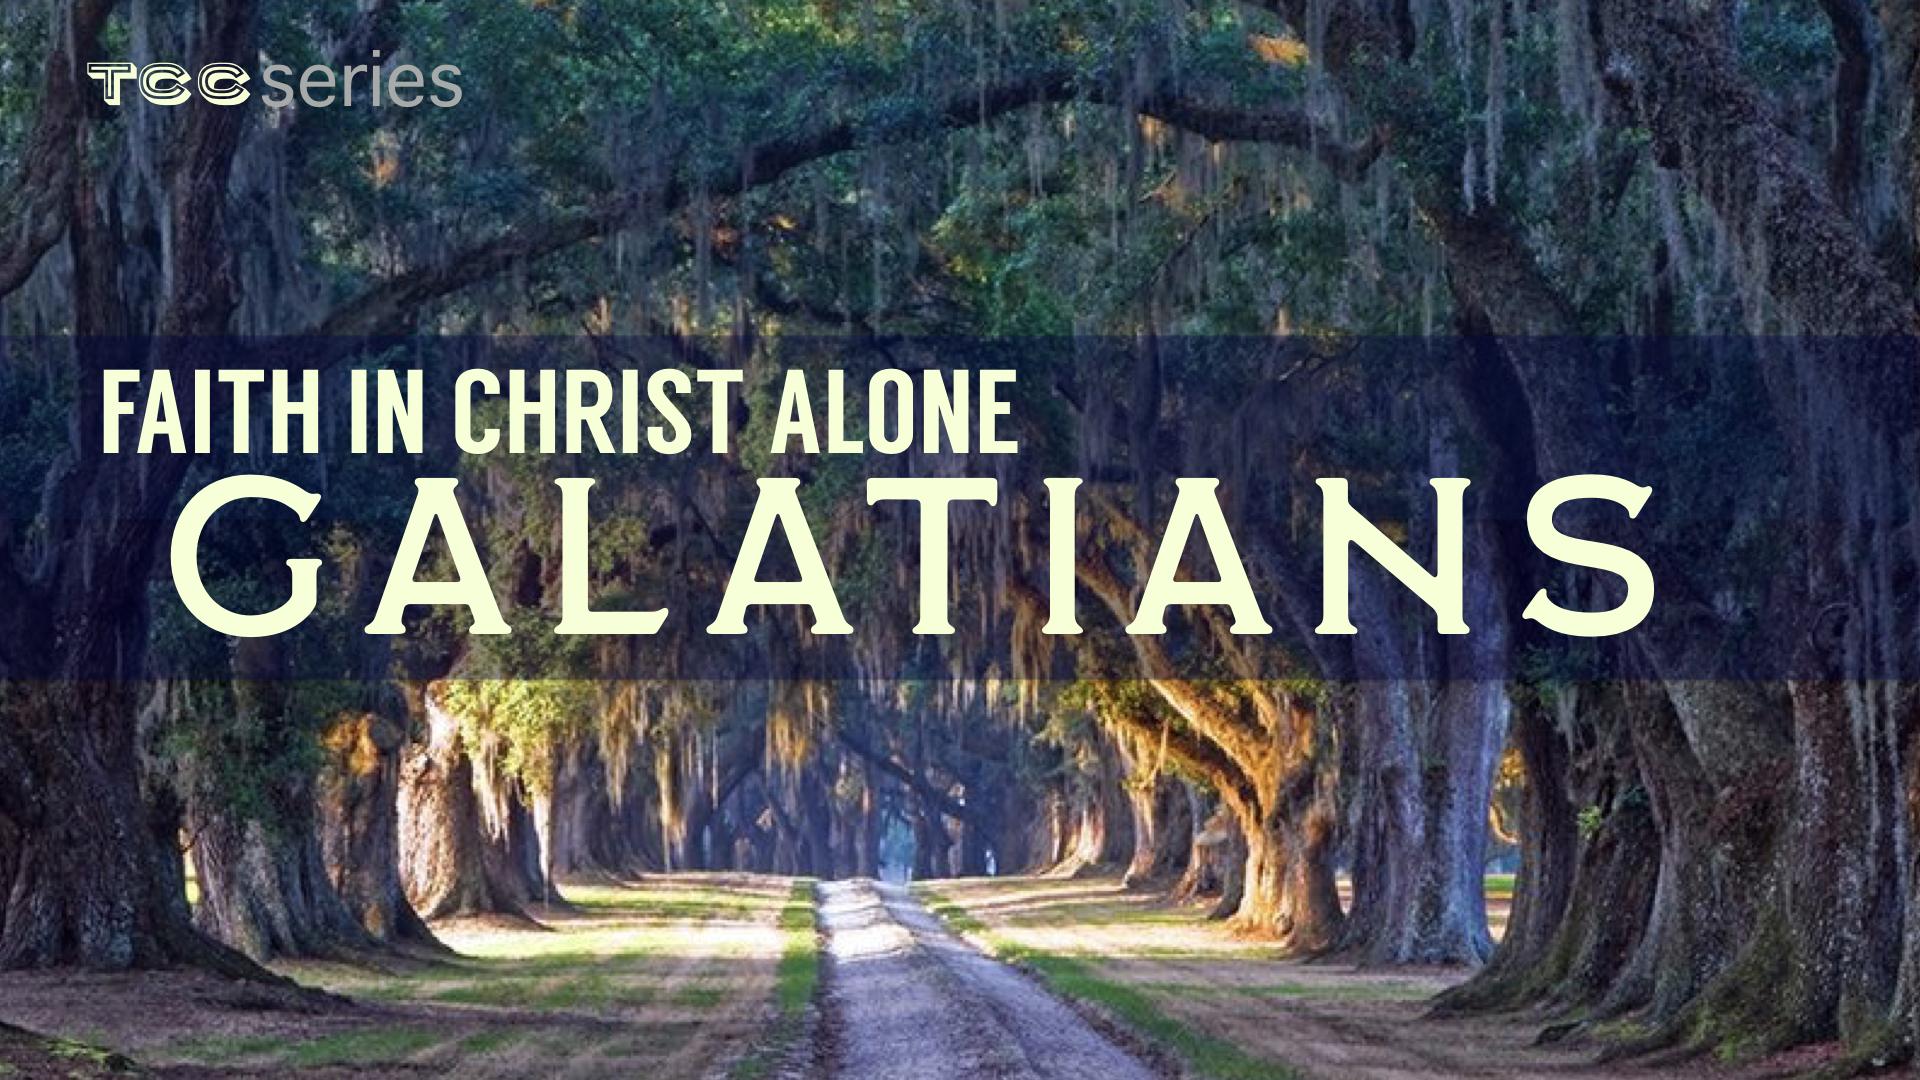 TCC Wide Announcements - Galatians.001.jpeg